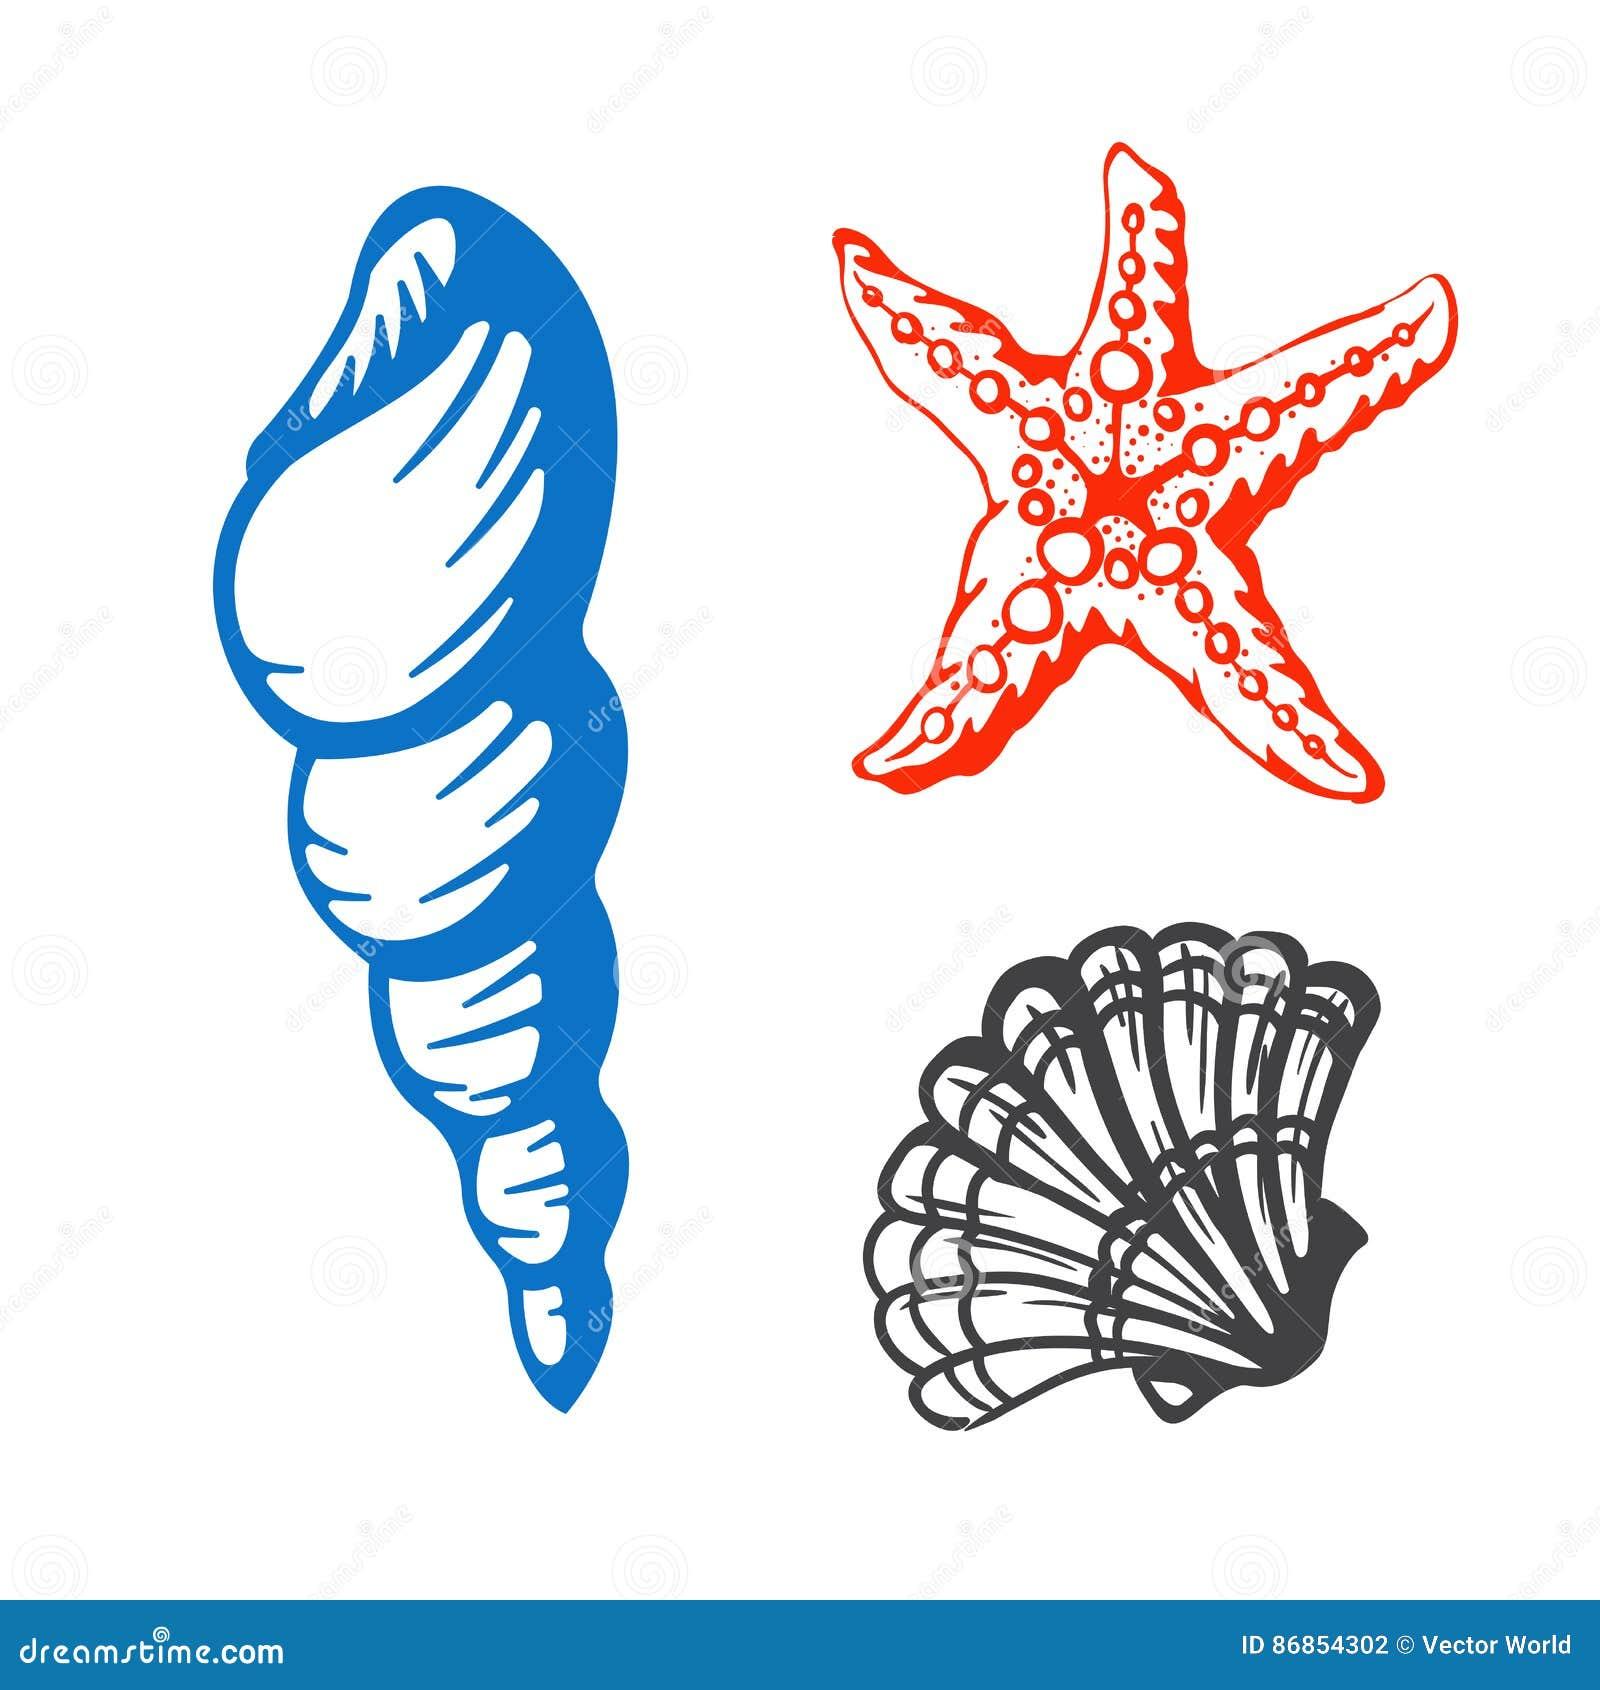 Denna morska ręka rysująca skorupy nakreślenia wektoru ilustracja